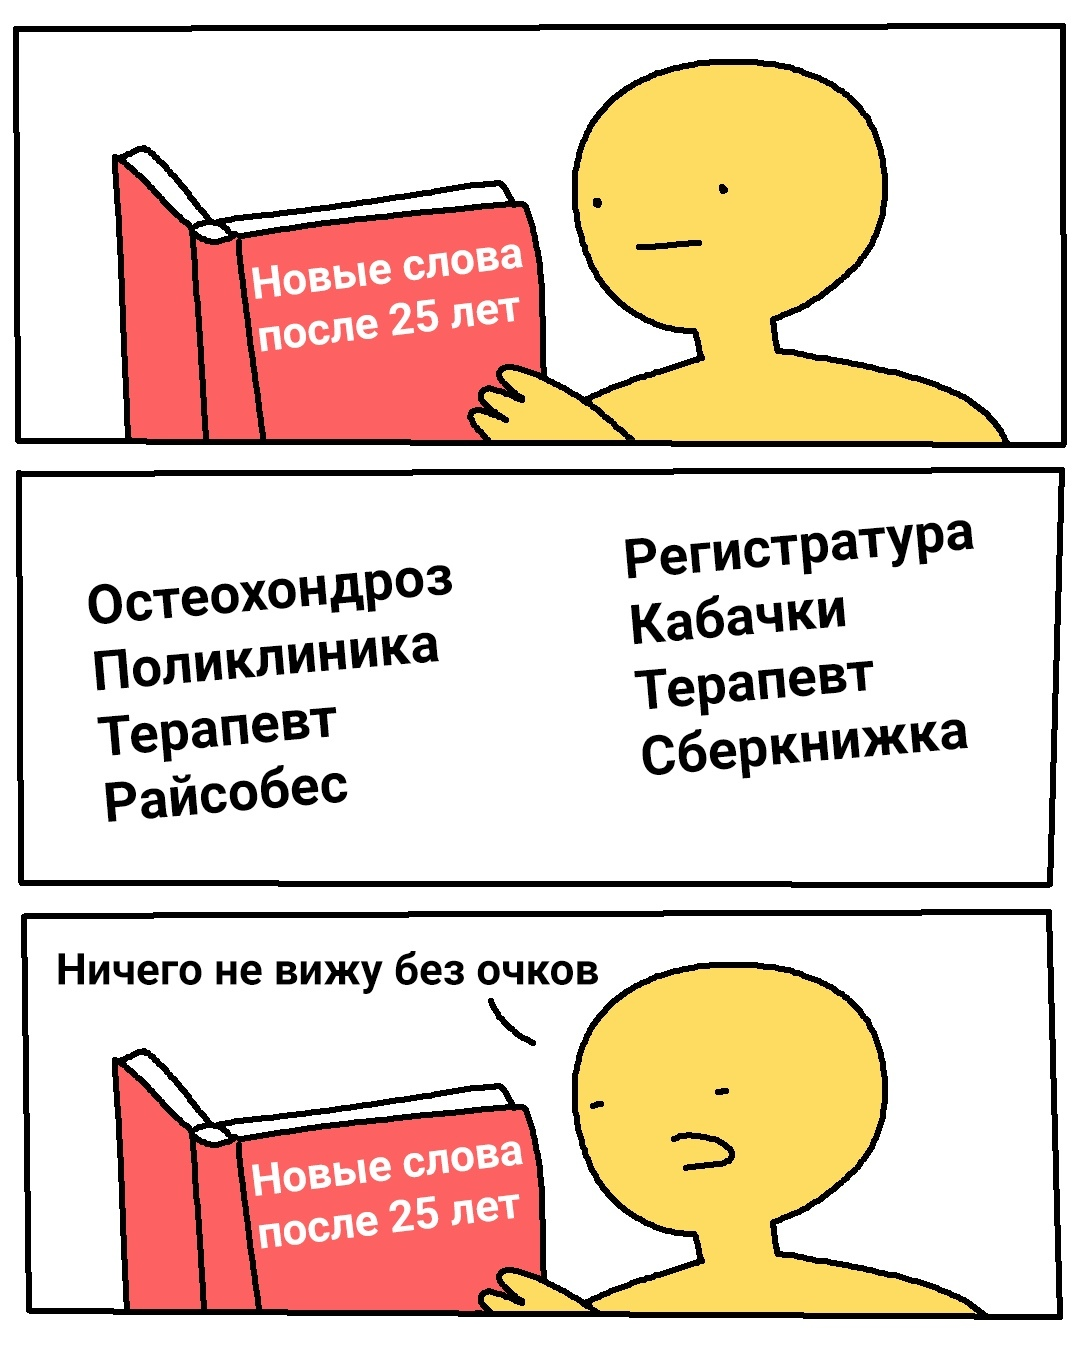 https://cs12.pikabu.ru/post_img/big/2020/09/19/7/1600512709152686060.jpg